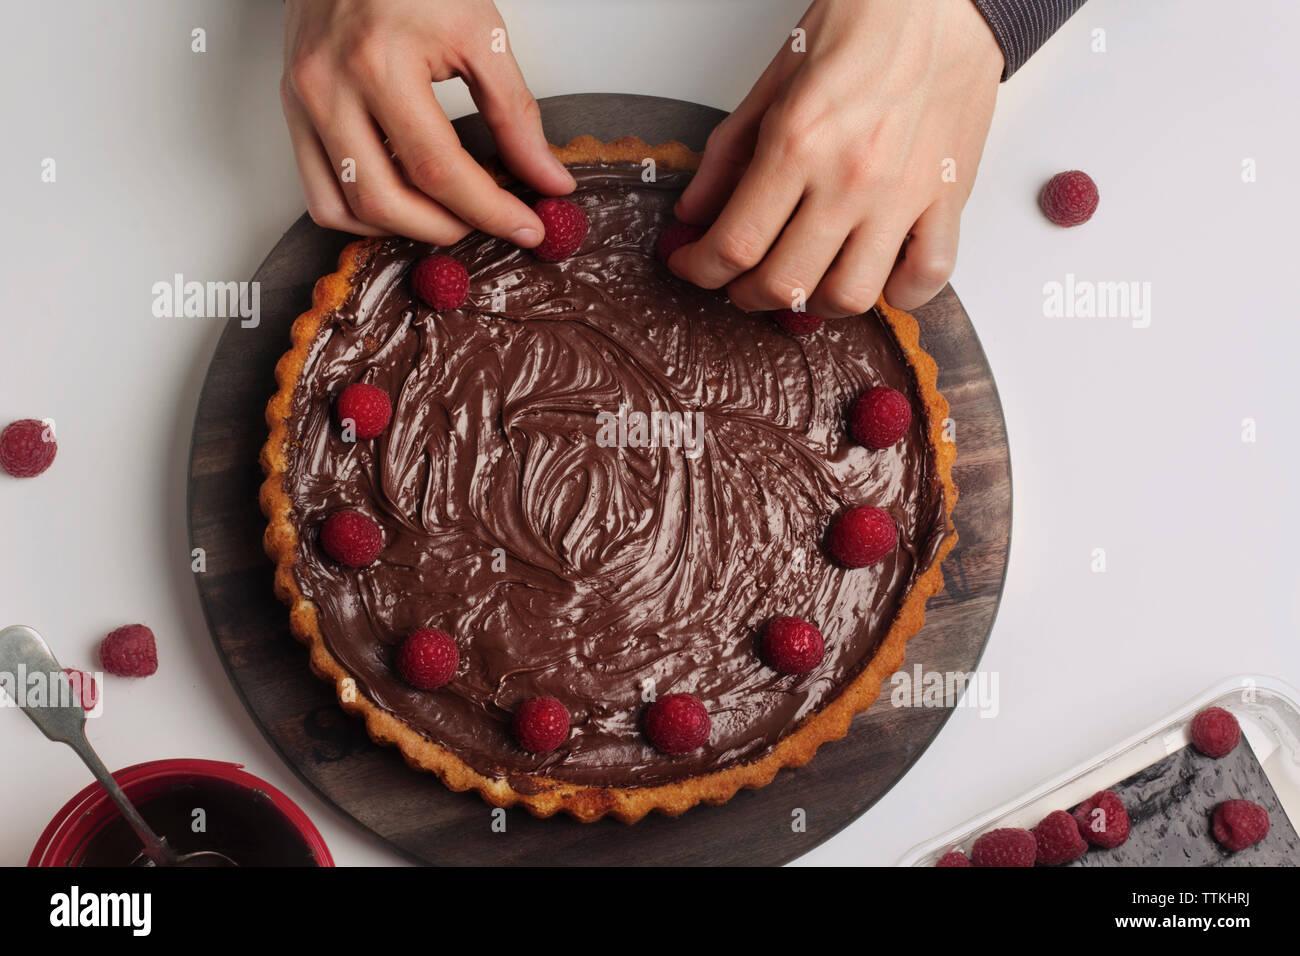 Man decorating chocolate tart with raspberries - Stock Image